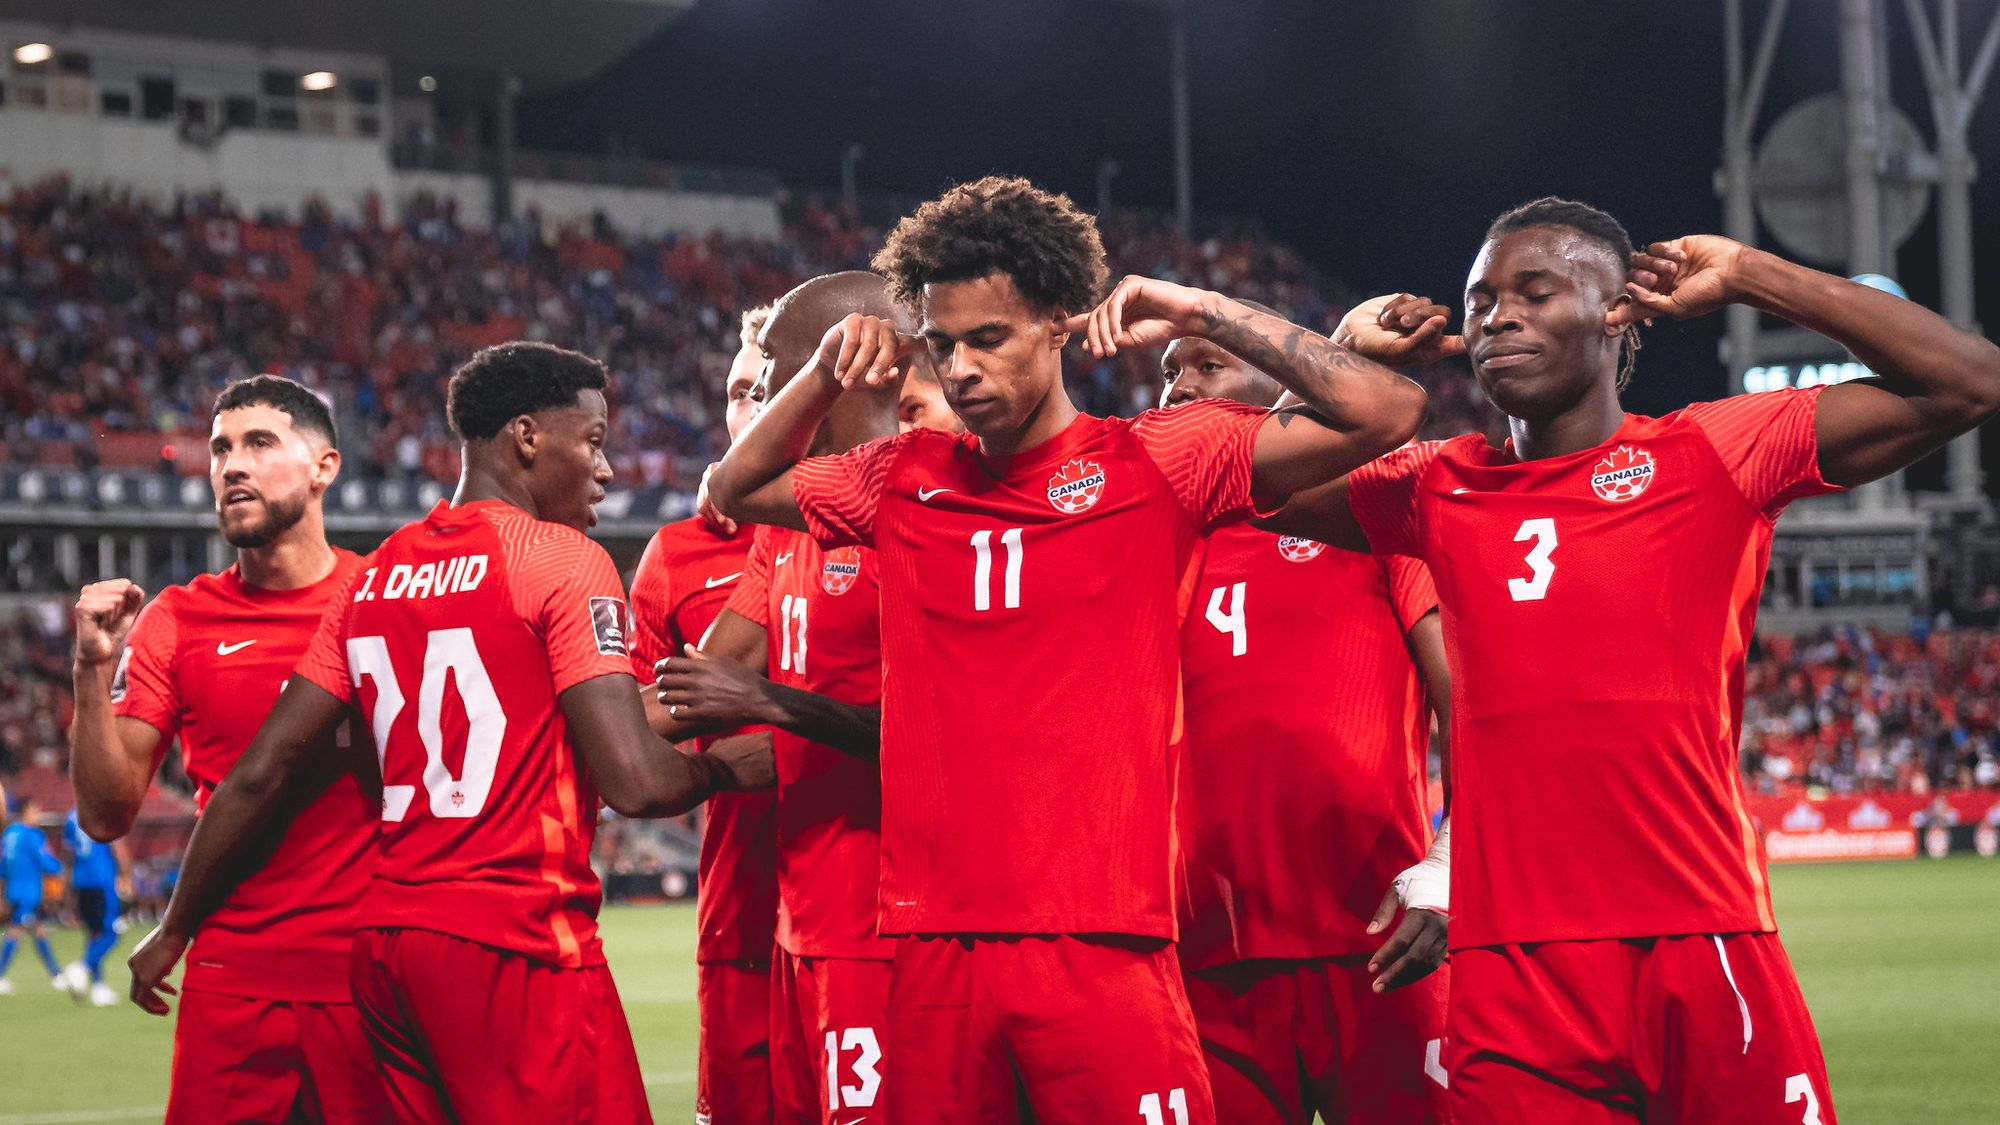 Canada earn impressive 3:0 win over El Salvador in FIFA World Cup Qatar 2022™ Qualifiers